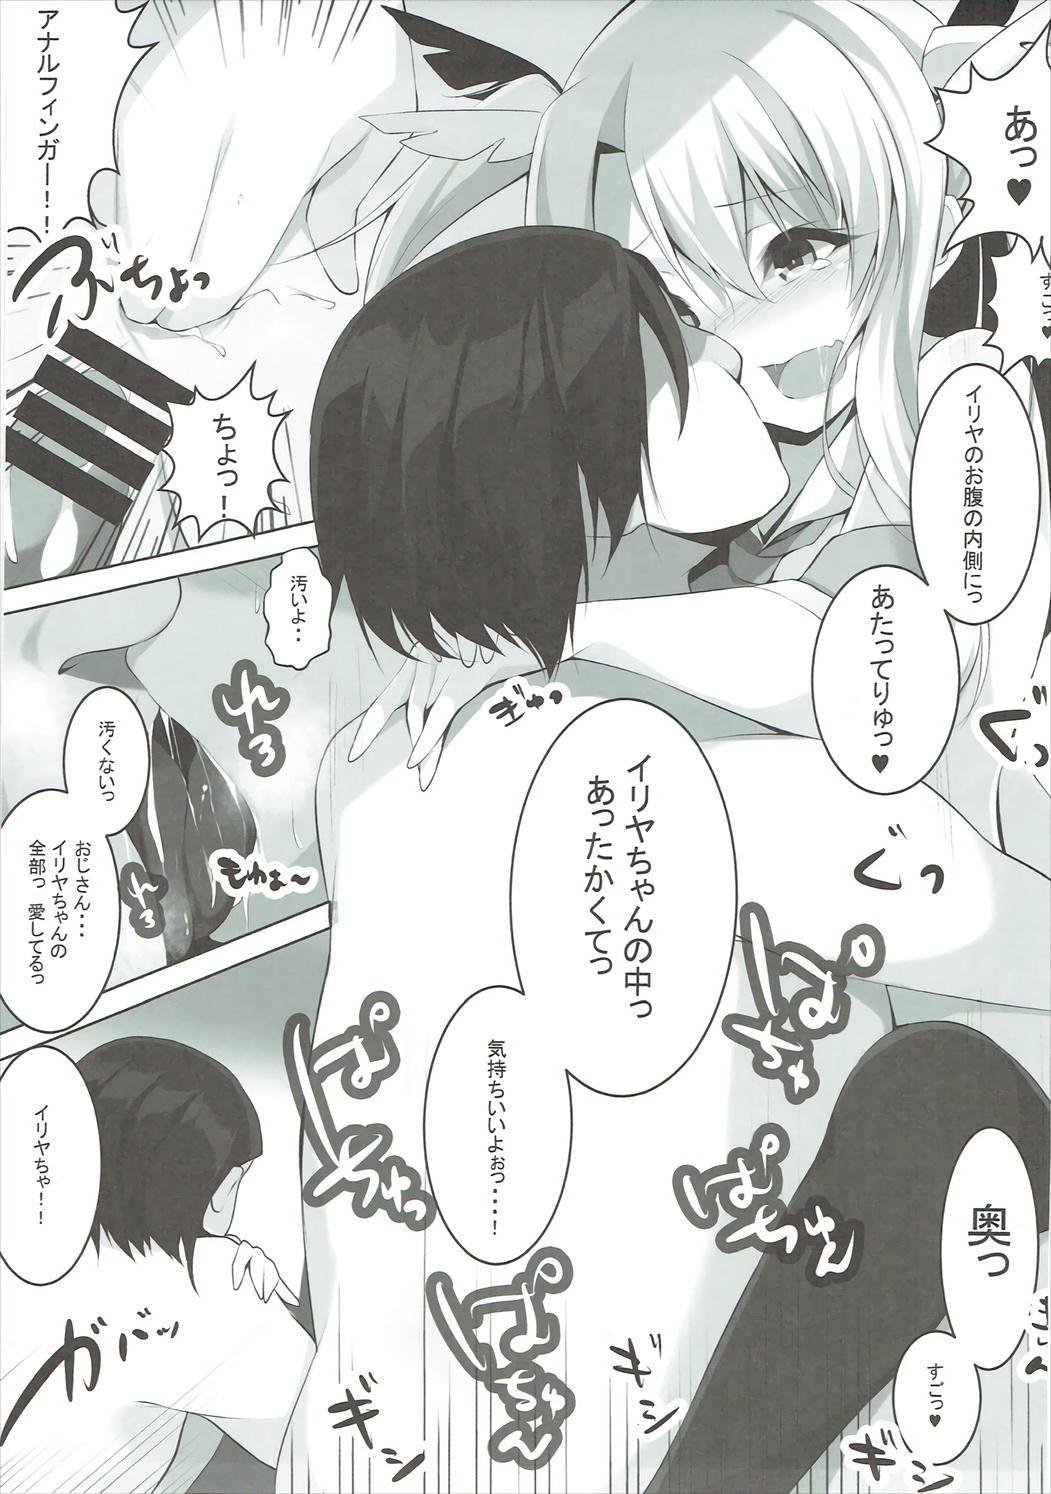 Enkou Mahou Shoujo Illya no Inkou Nikki File1: Longe Oji-san 9